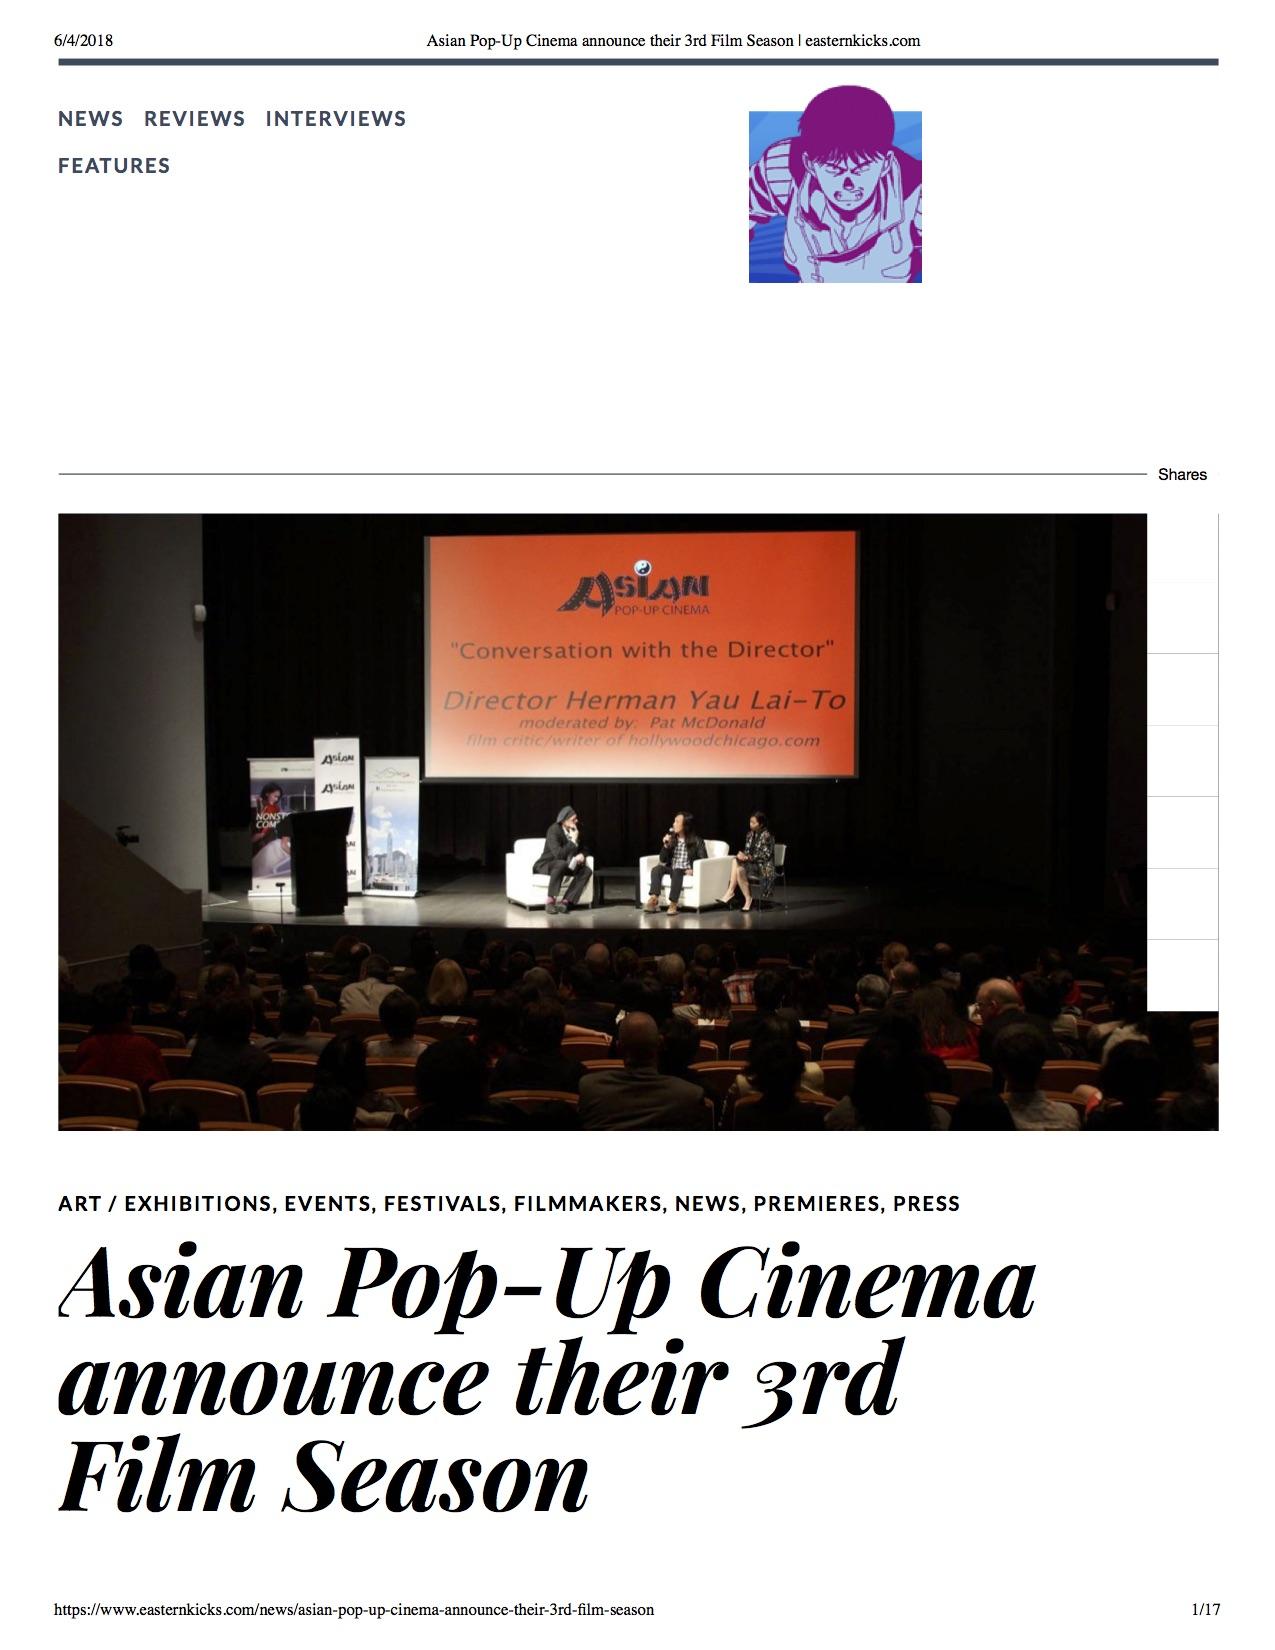 1Asian Pop-Up Cinema announce their 3rd Film Season _ easternkicks.jpg